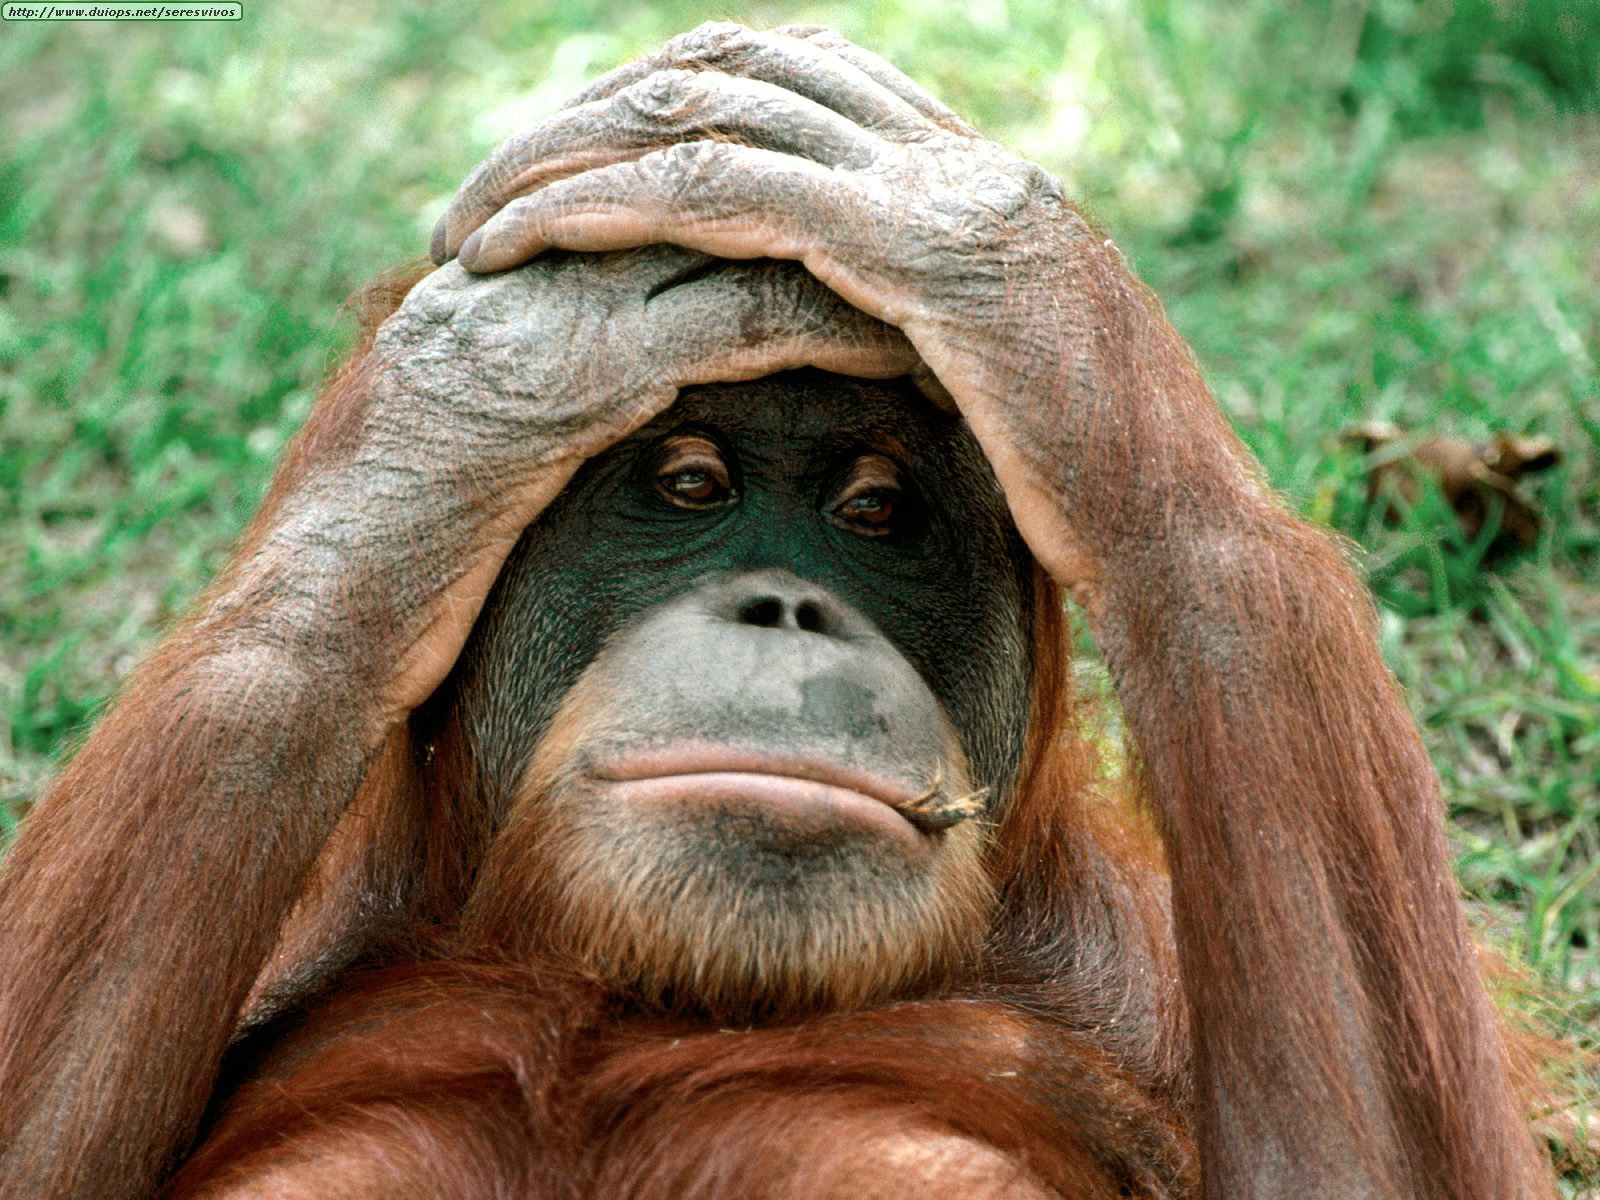 http://www.duiops.net/seresvivos/galeria/orangutanes/Orangutan,%20China.jpg